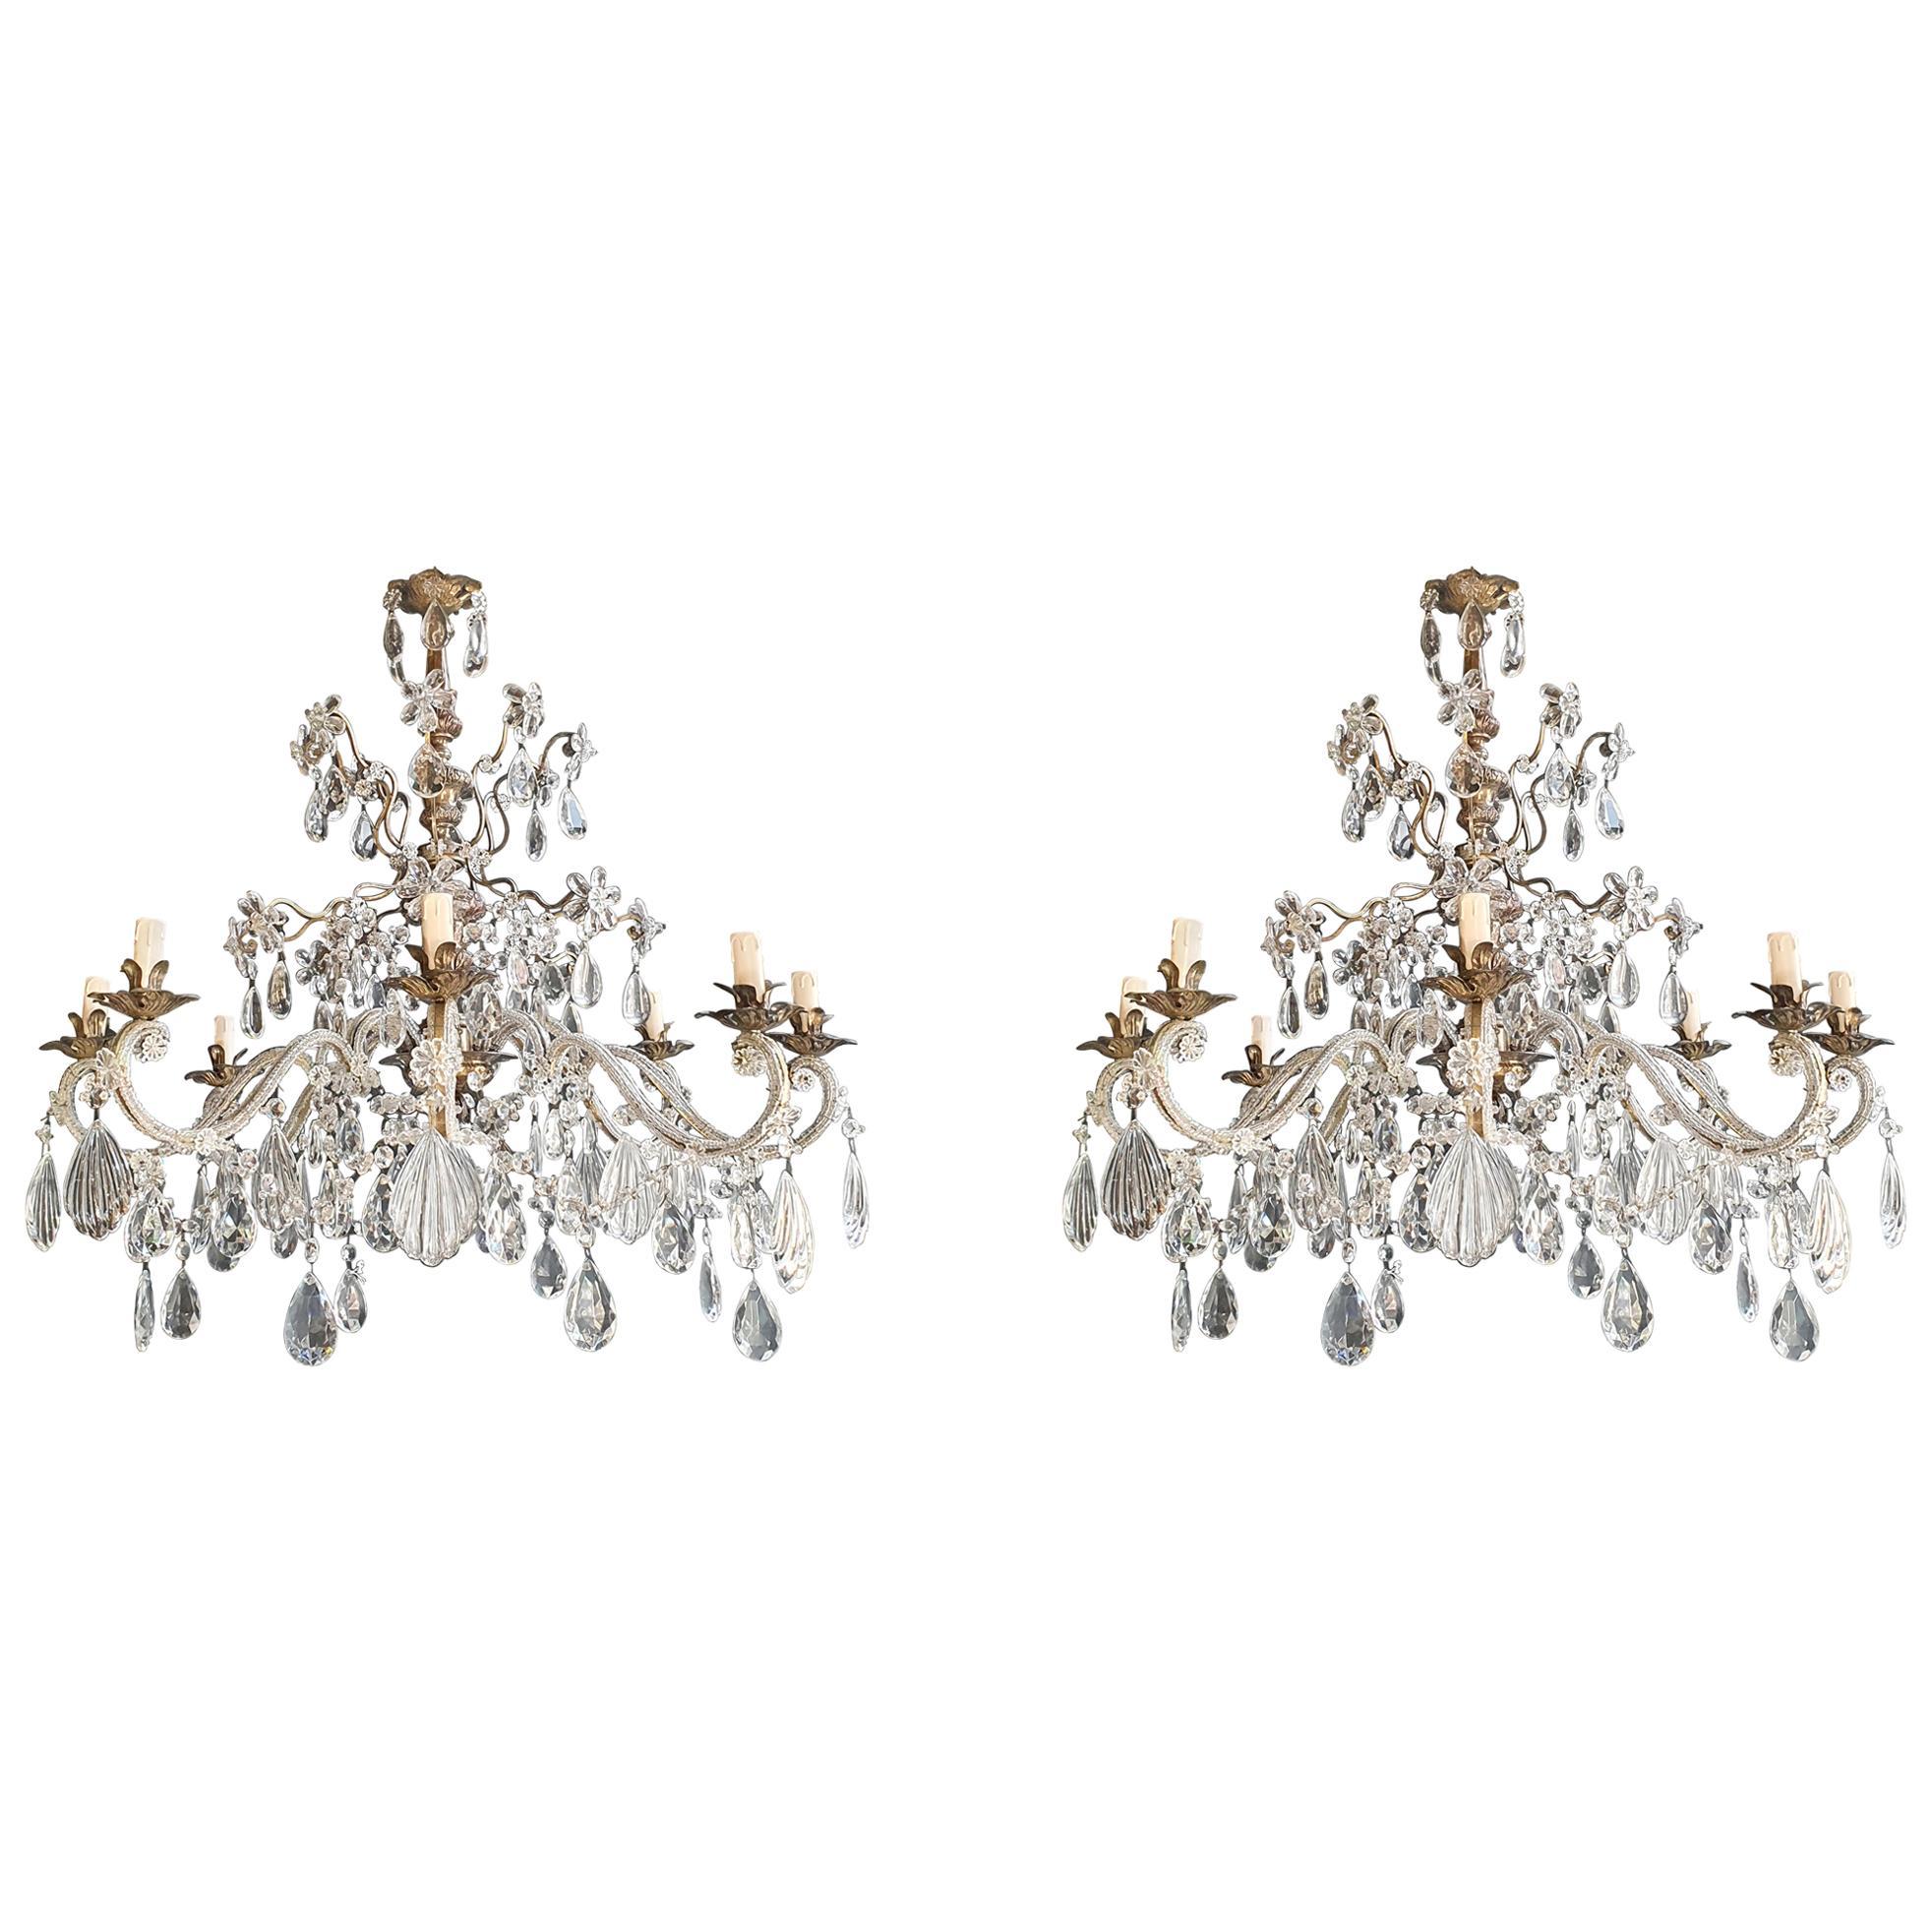 Pair of Silver Candelabrum Chandelier Crystal Antique Pendant Light